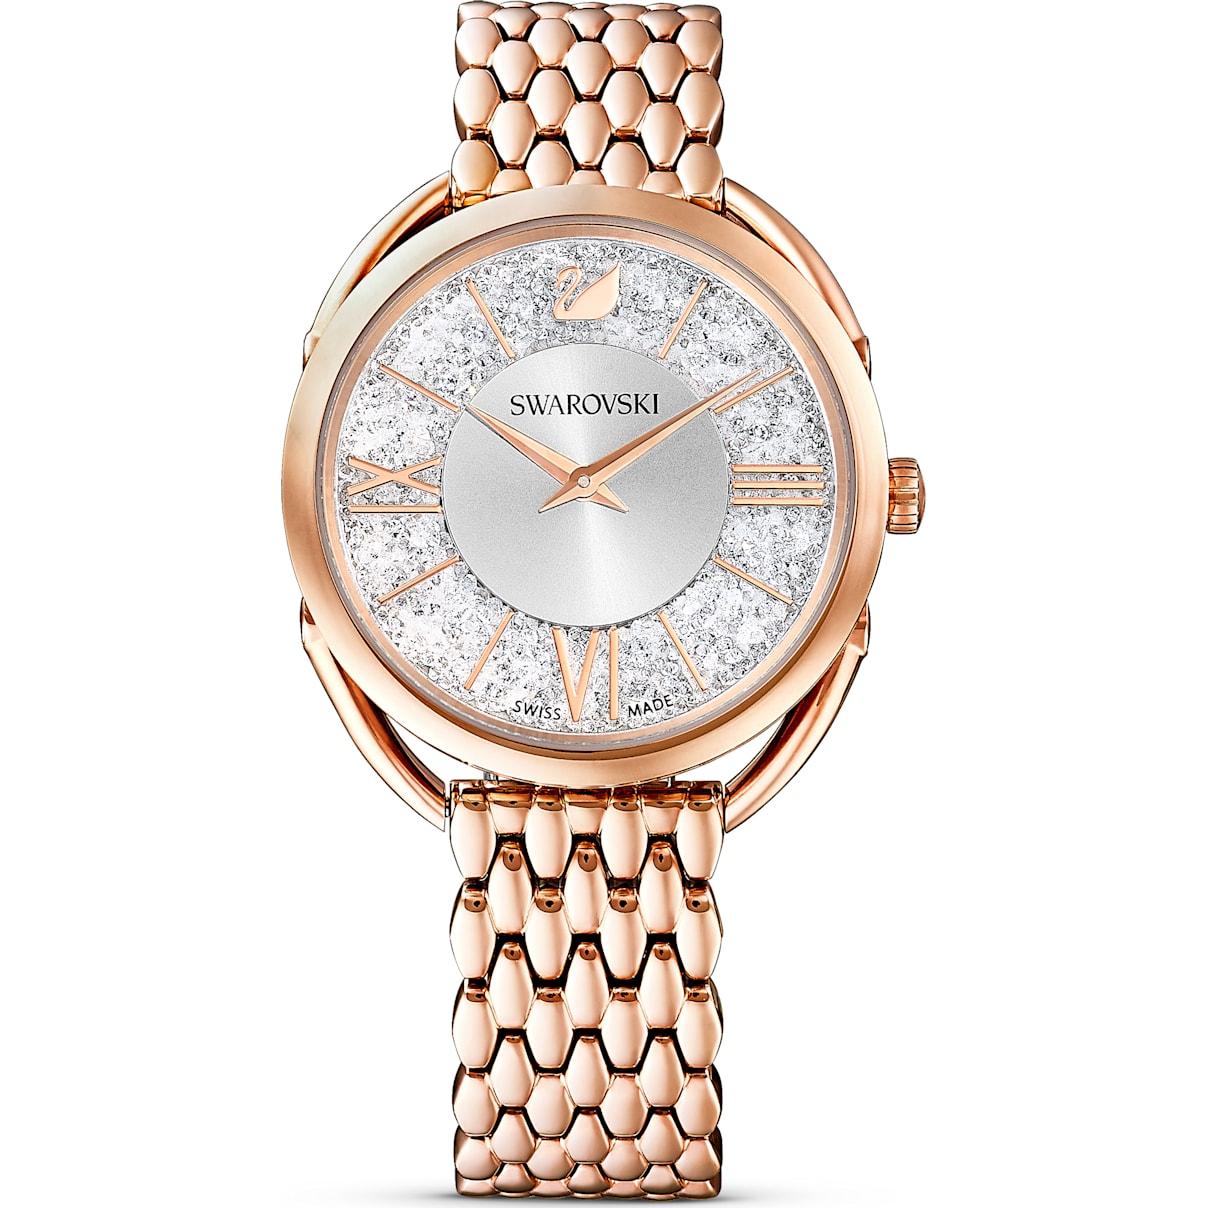 Swarovski Crystalline Glam Watch, Metal bracelet, White, Rose-gold tone PVD